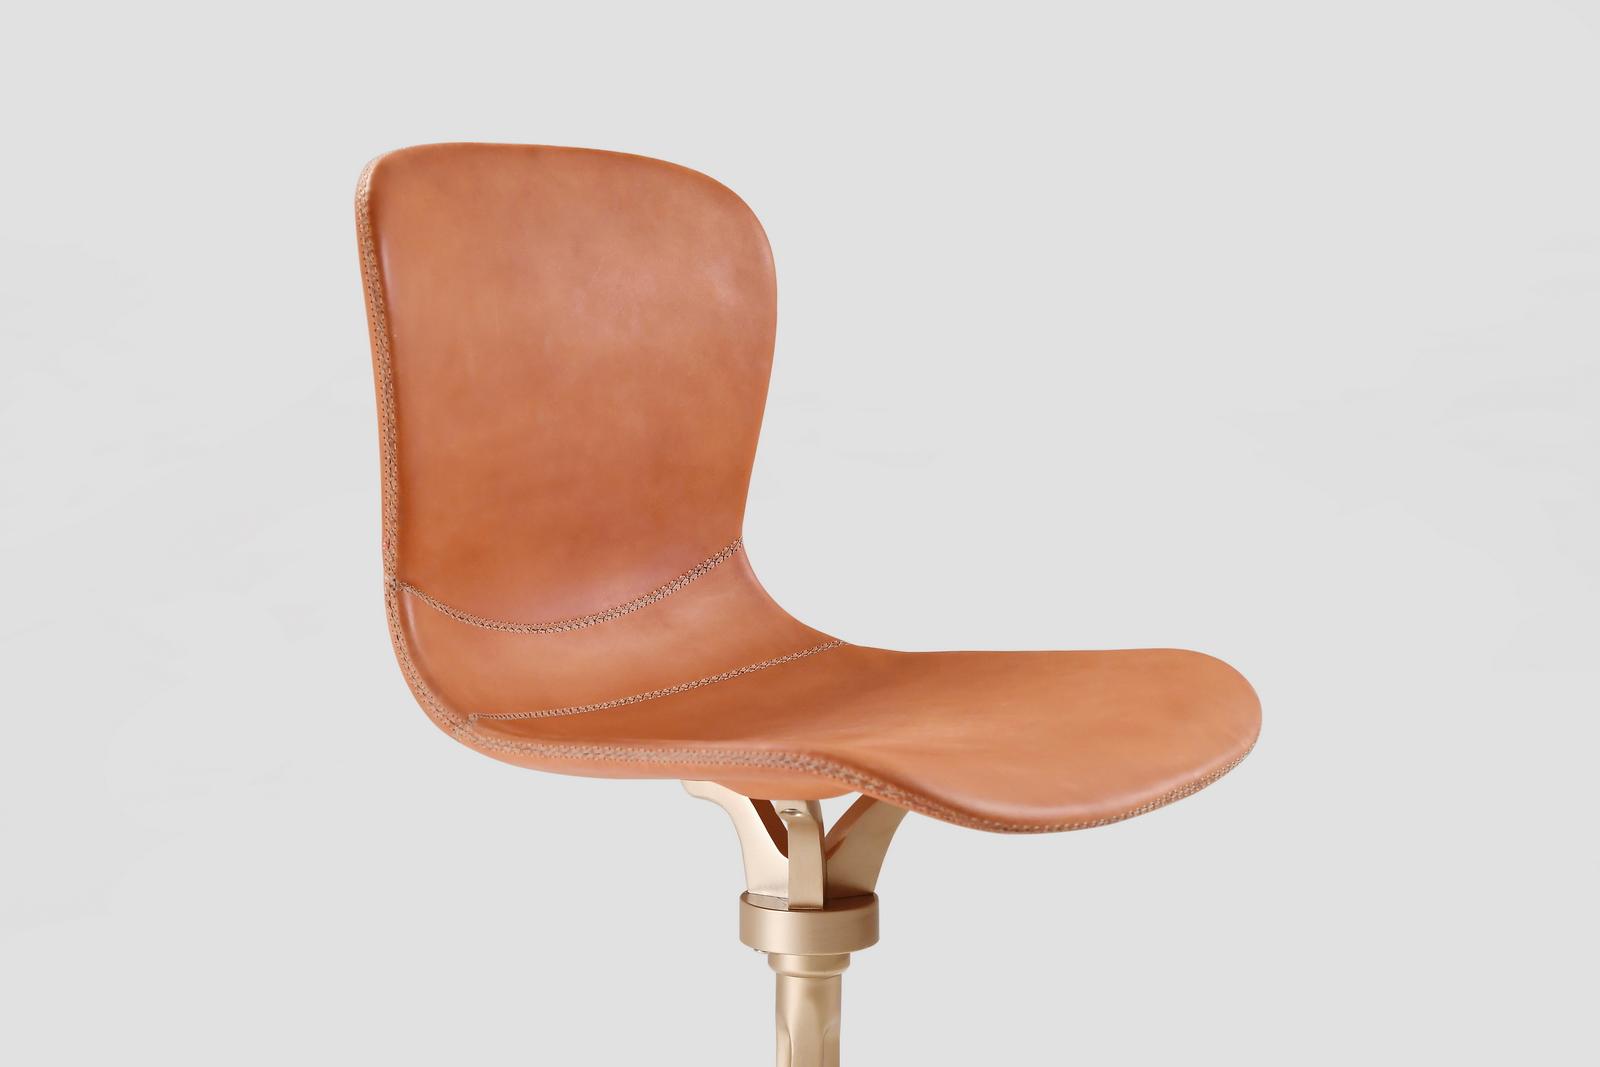 PTendercool-Chair-PT47-BS1-MB-200701-08